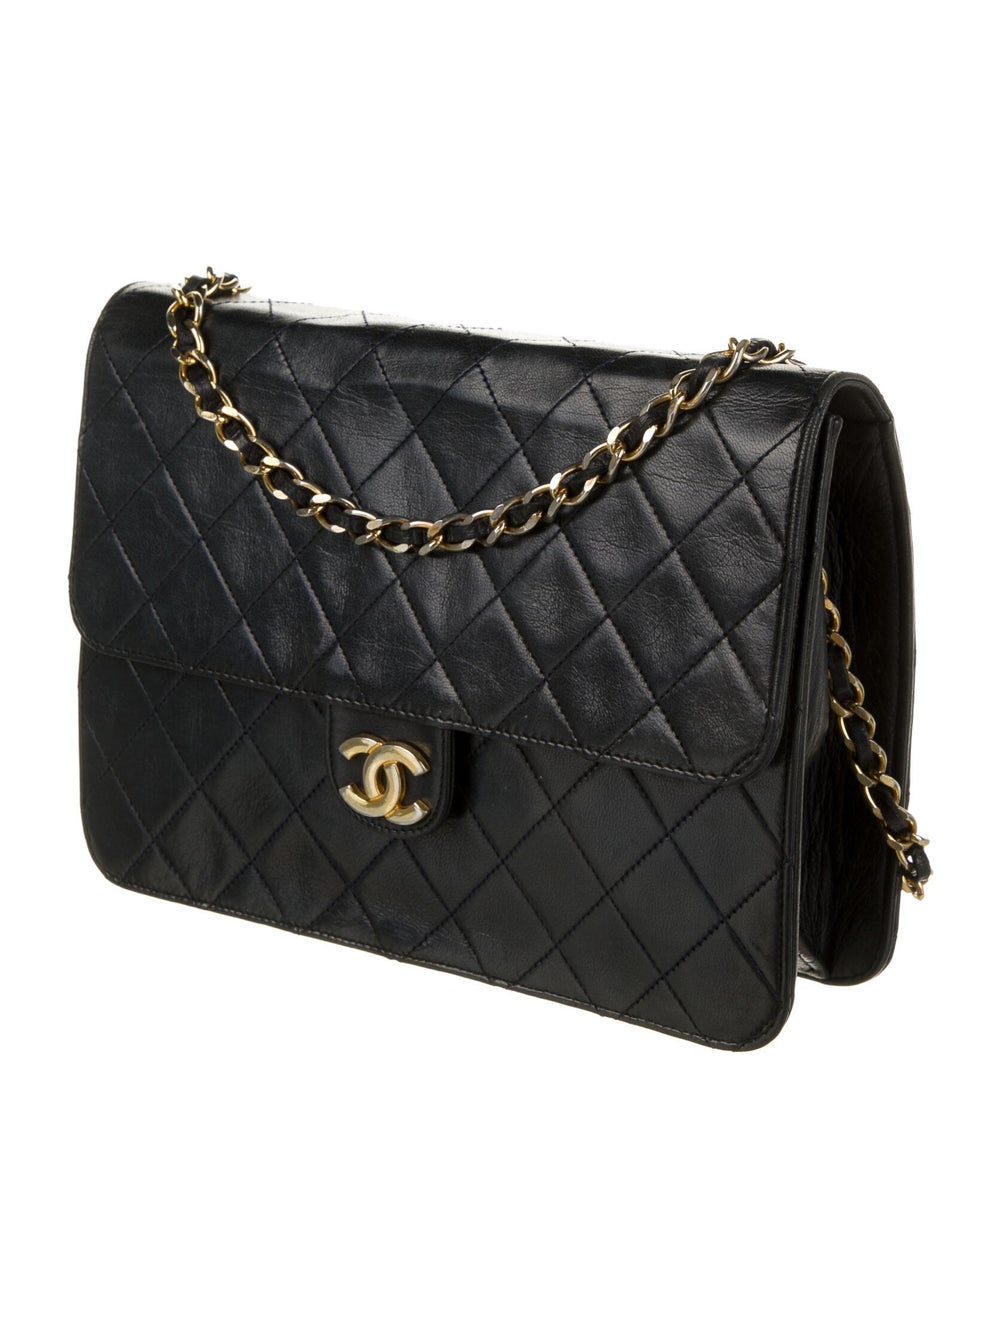 Chanel Vintage Classic Single Flap Bag Blue - image 3